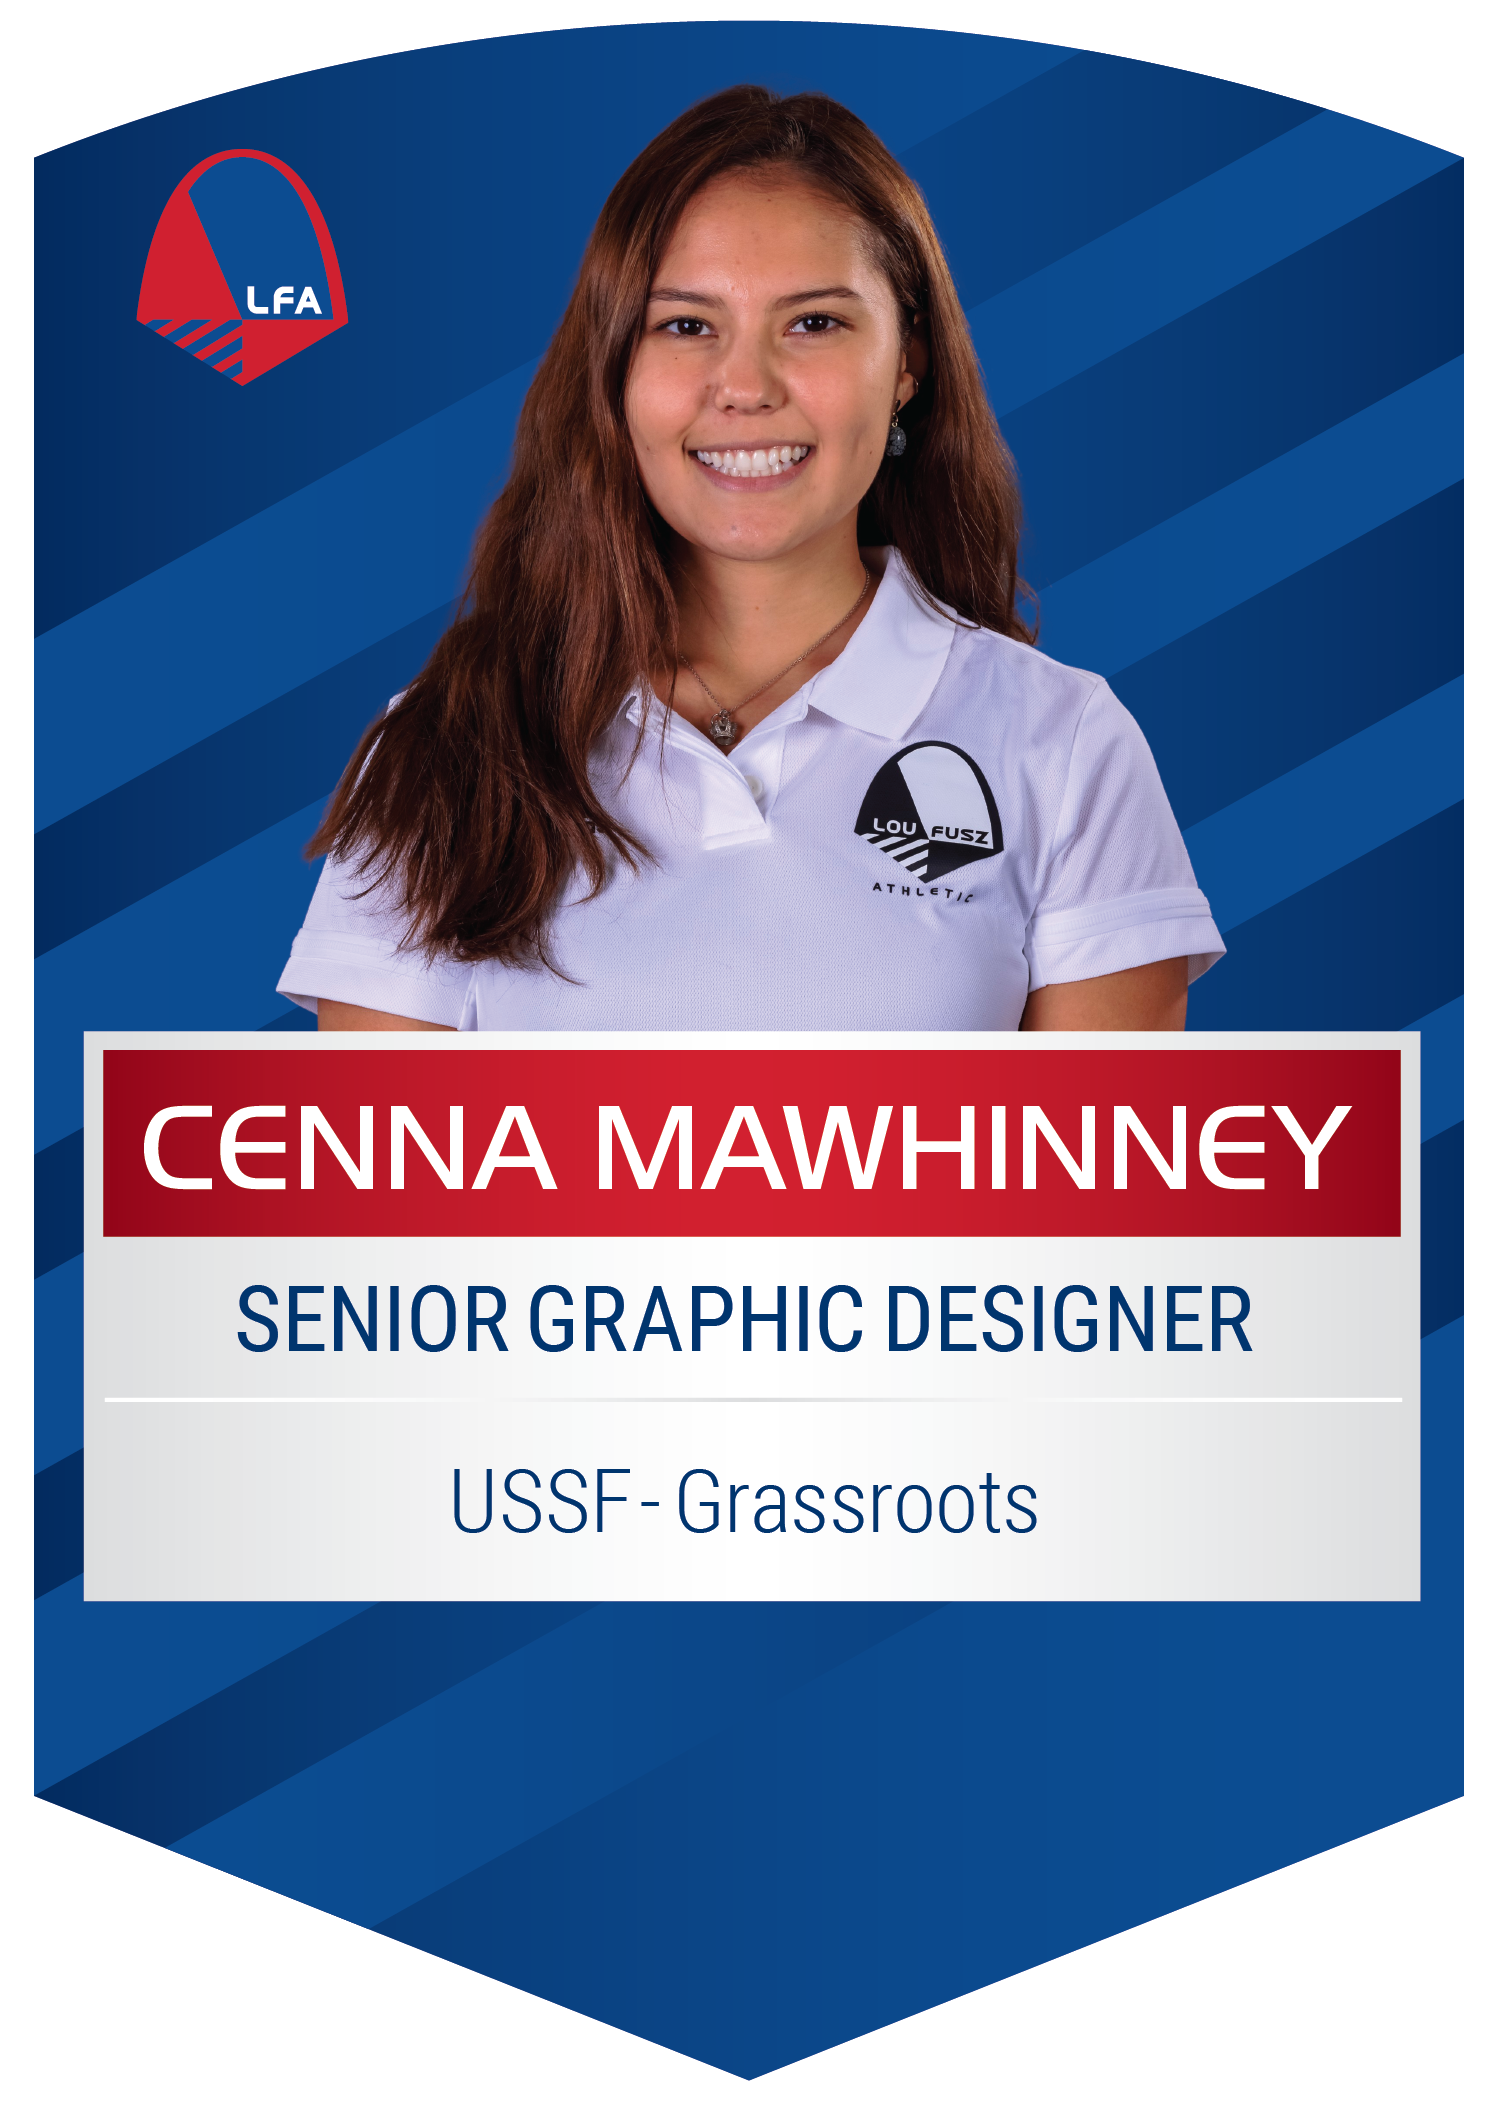 Cenna Mawhinney